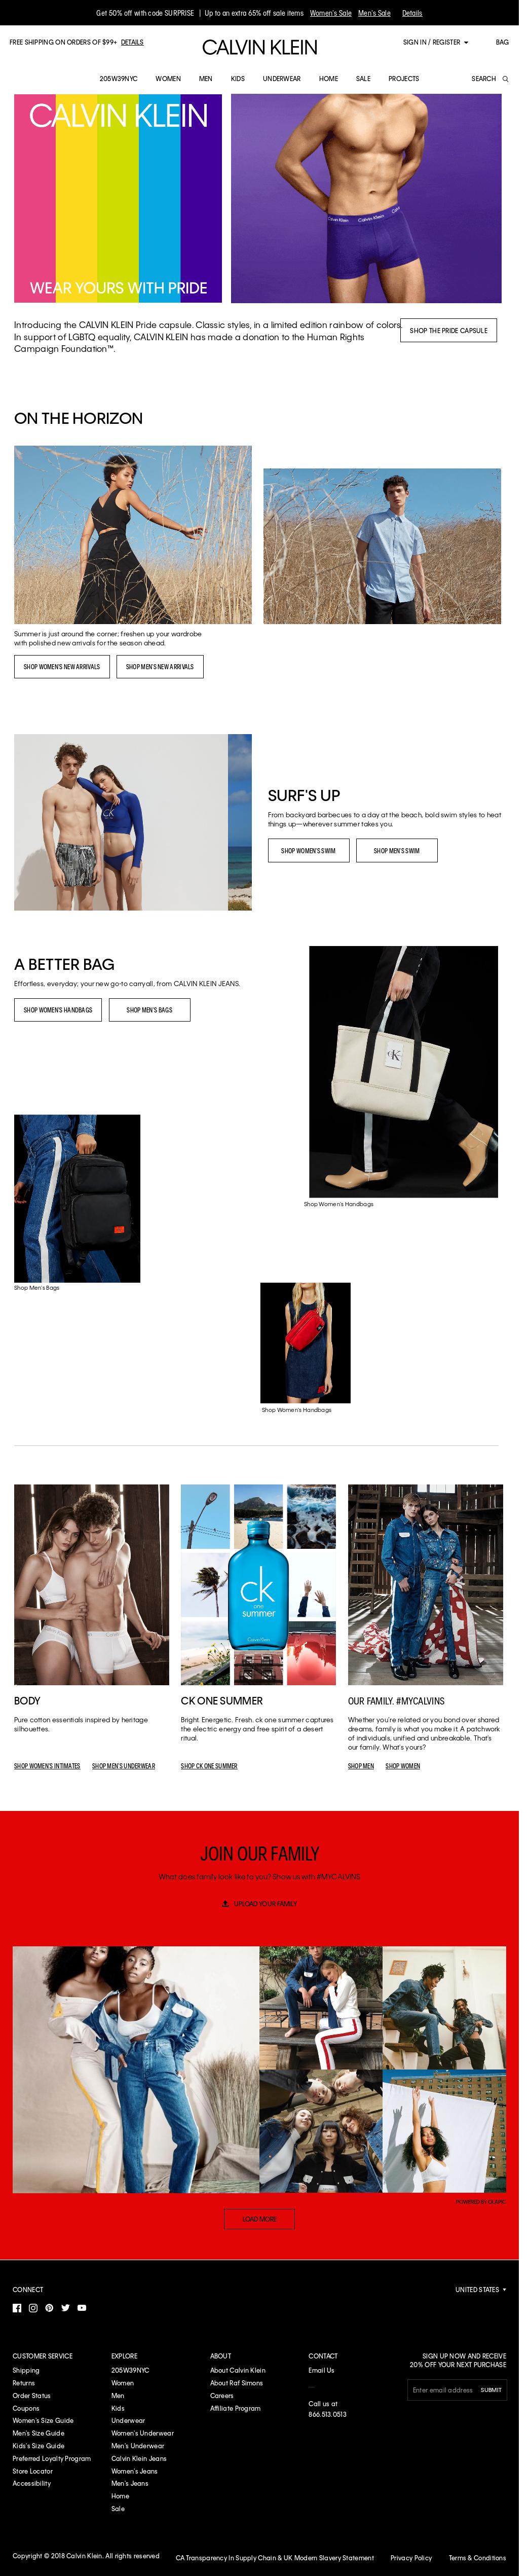 2b0154b2b5f Calvin Klein Competitors, Revenue and Employees - Owler Company Profile